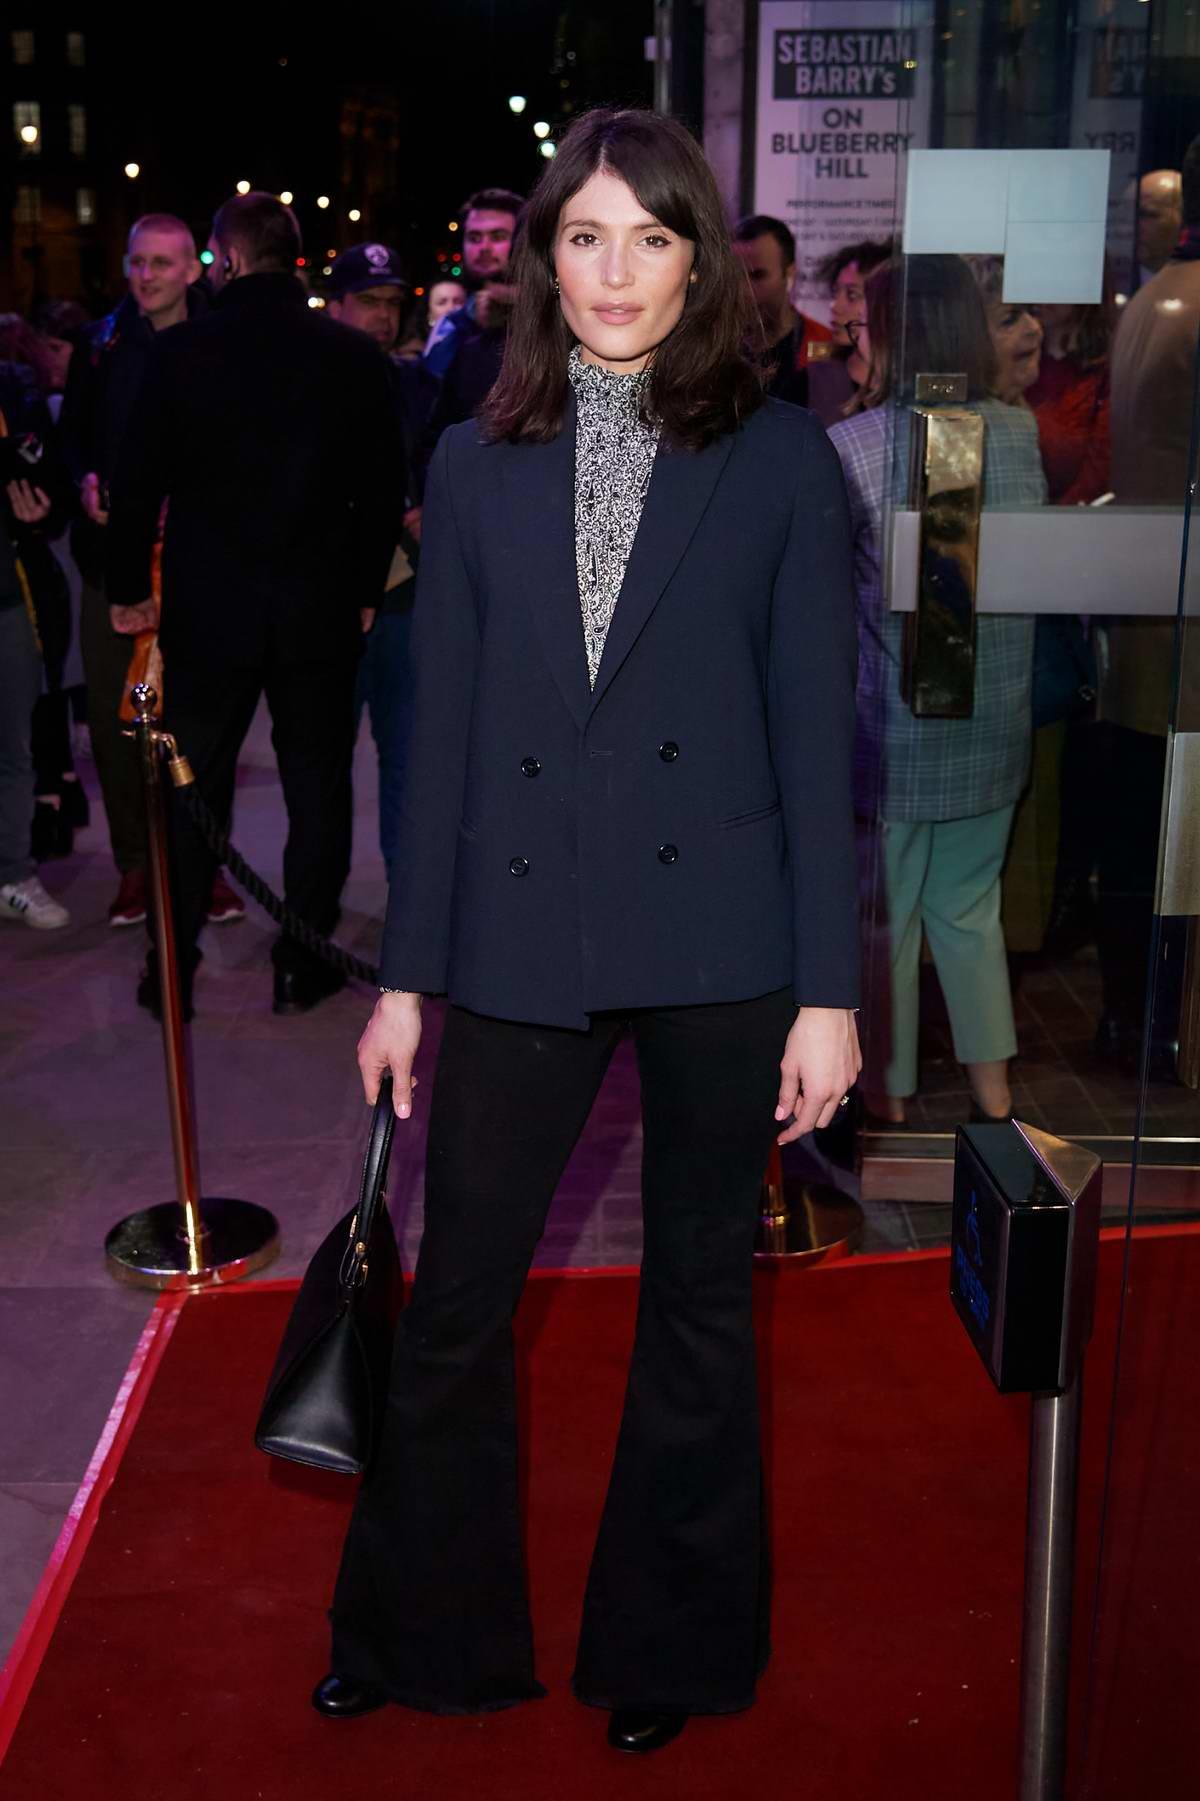 Gemma Arterton attends 'On Blueberry Hill' press night in London, UK